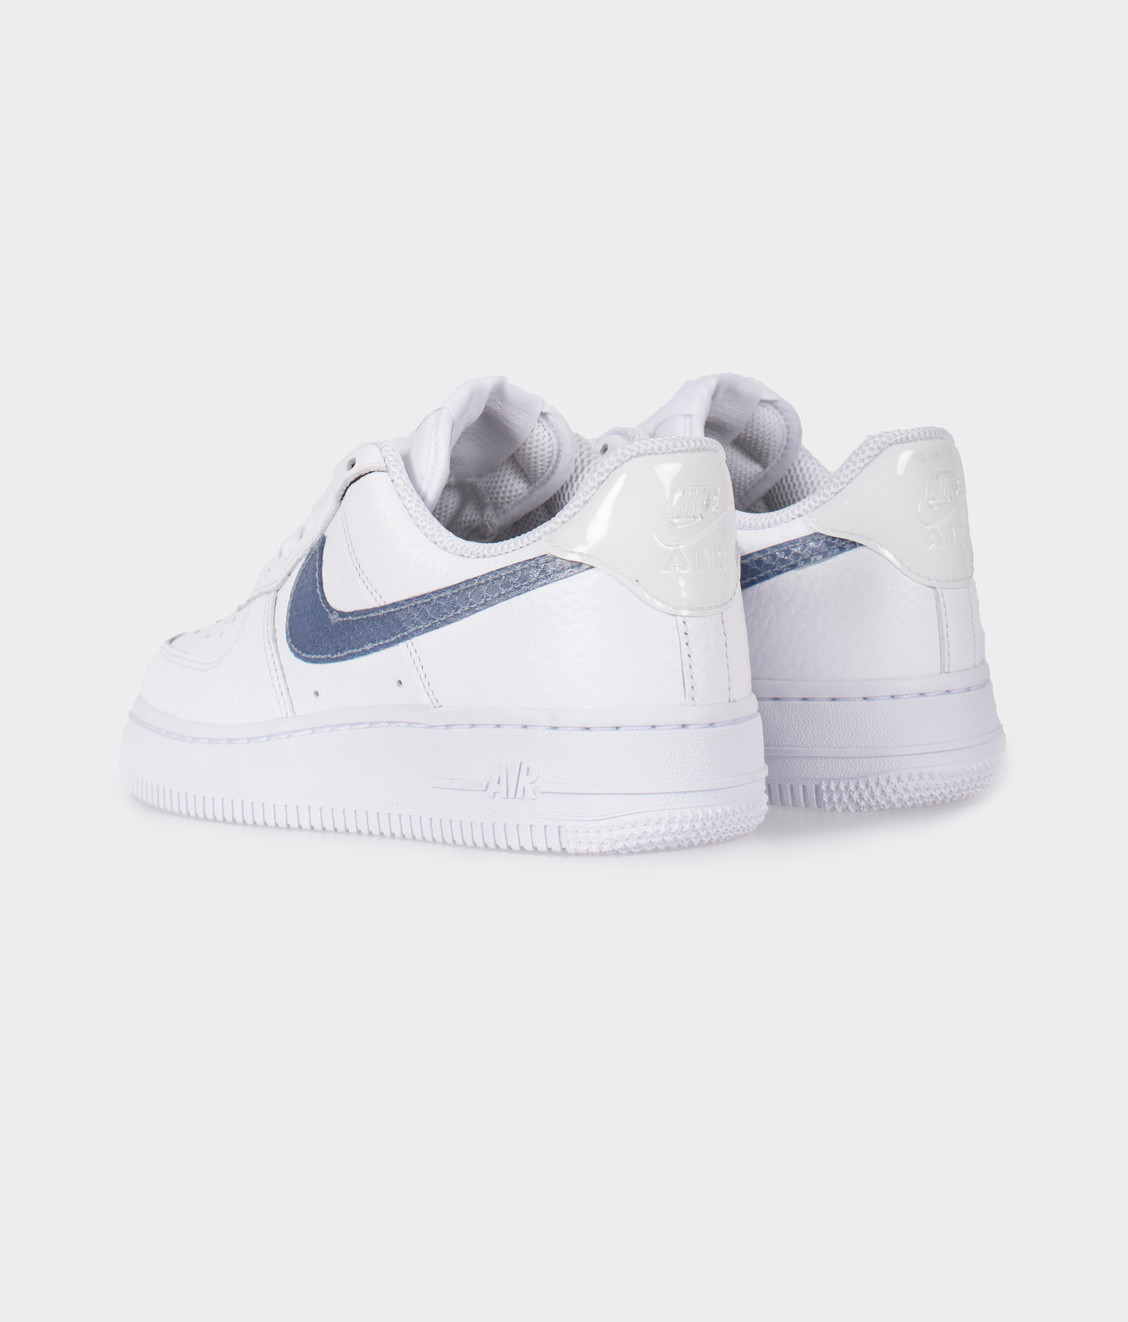 Nike Nike Air Force 1 LV8 White Thunderstorm